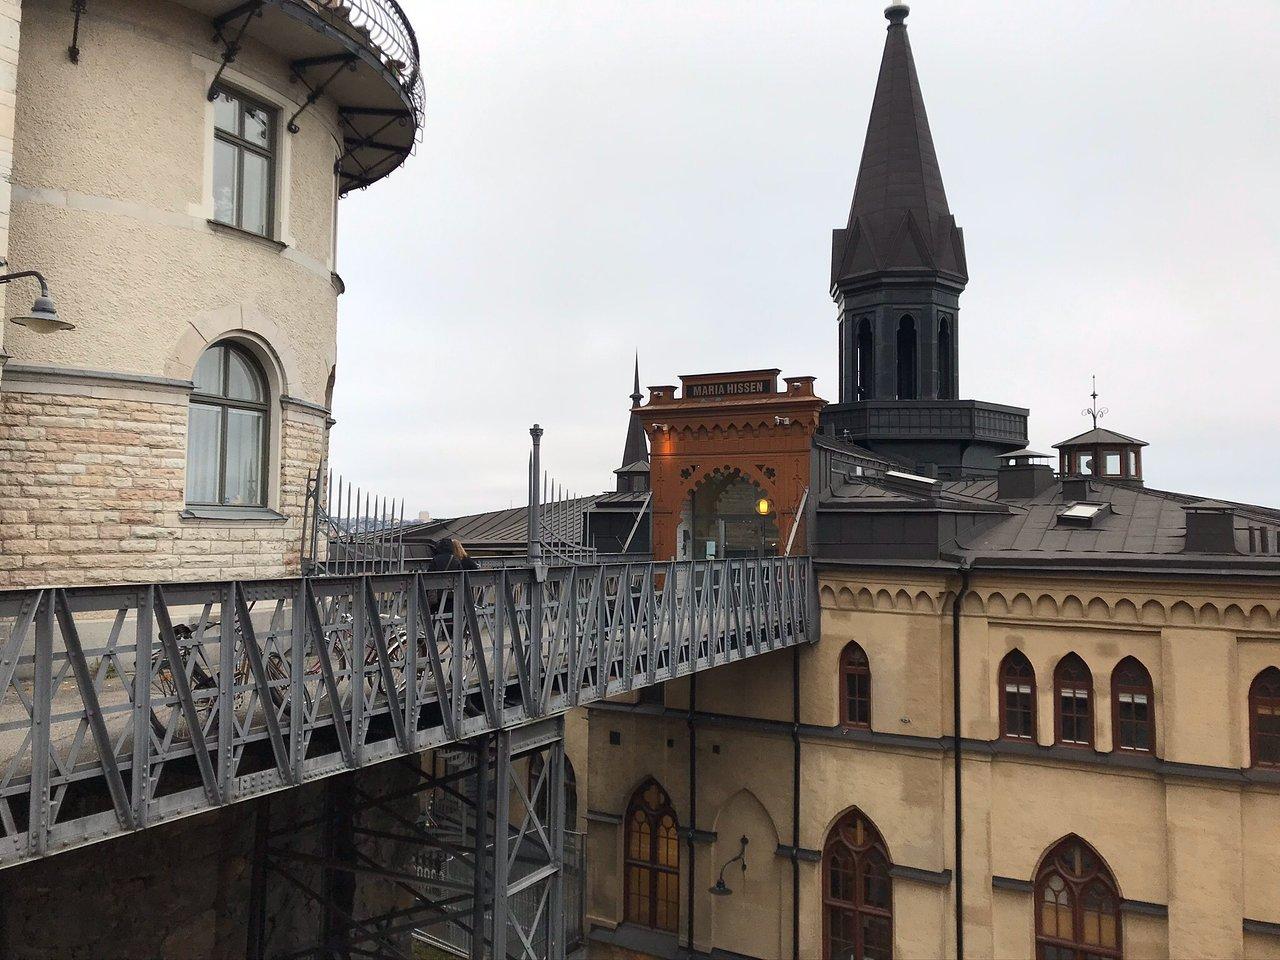 Sodermalm Tukholma Ruotsi Arvostelut Tripadvisor